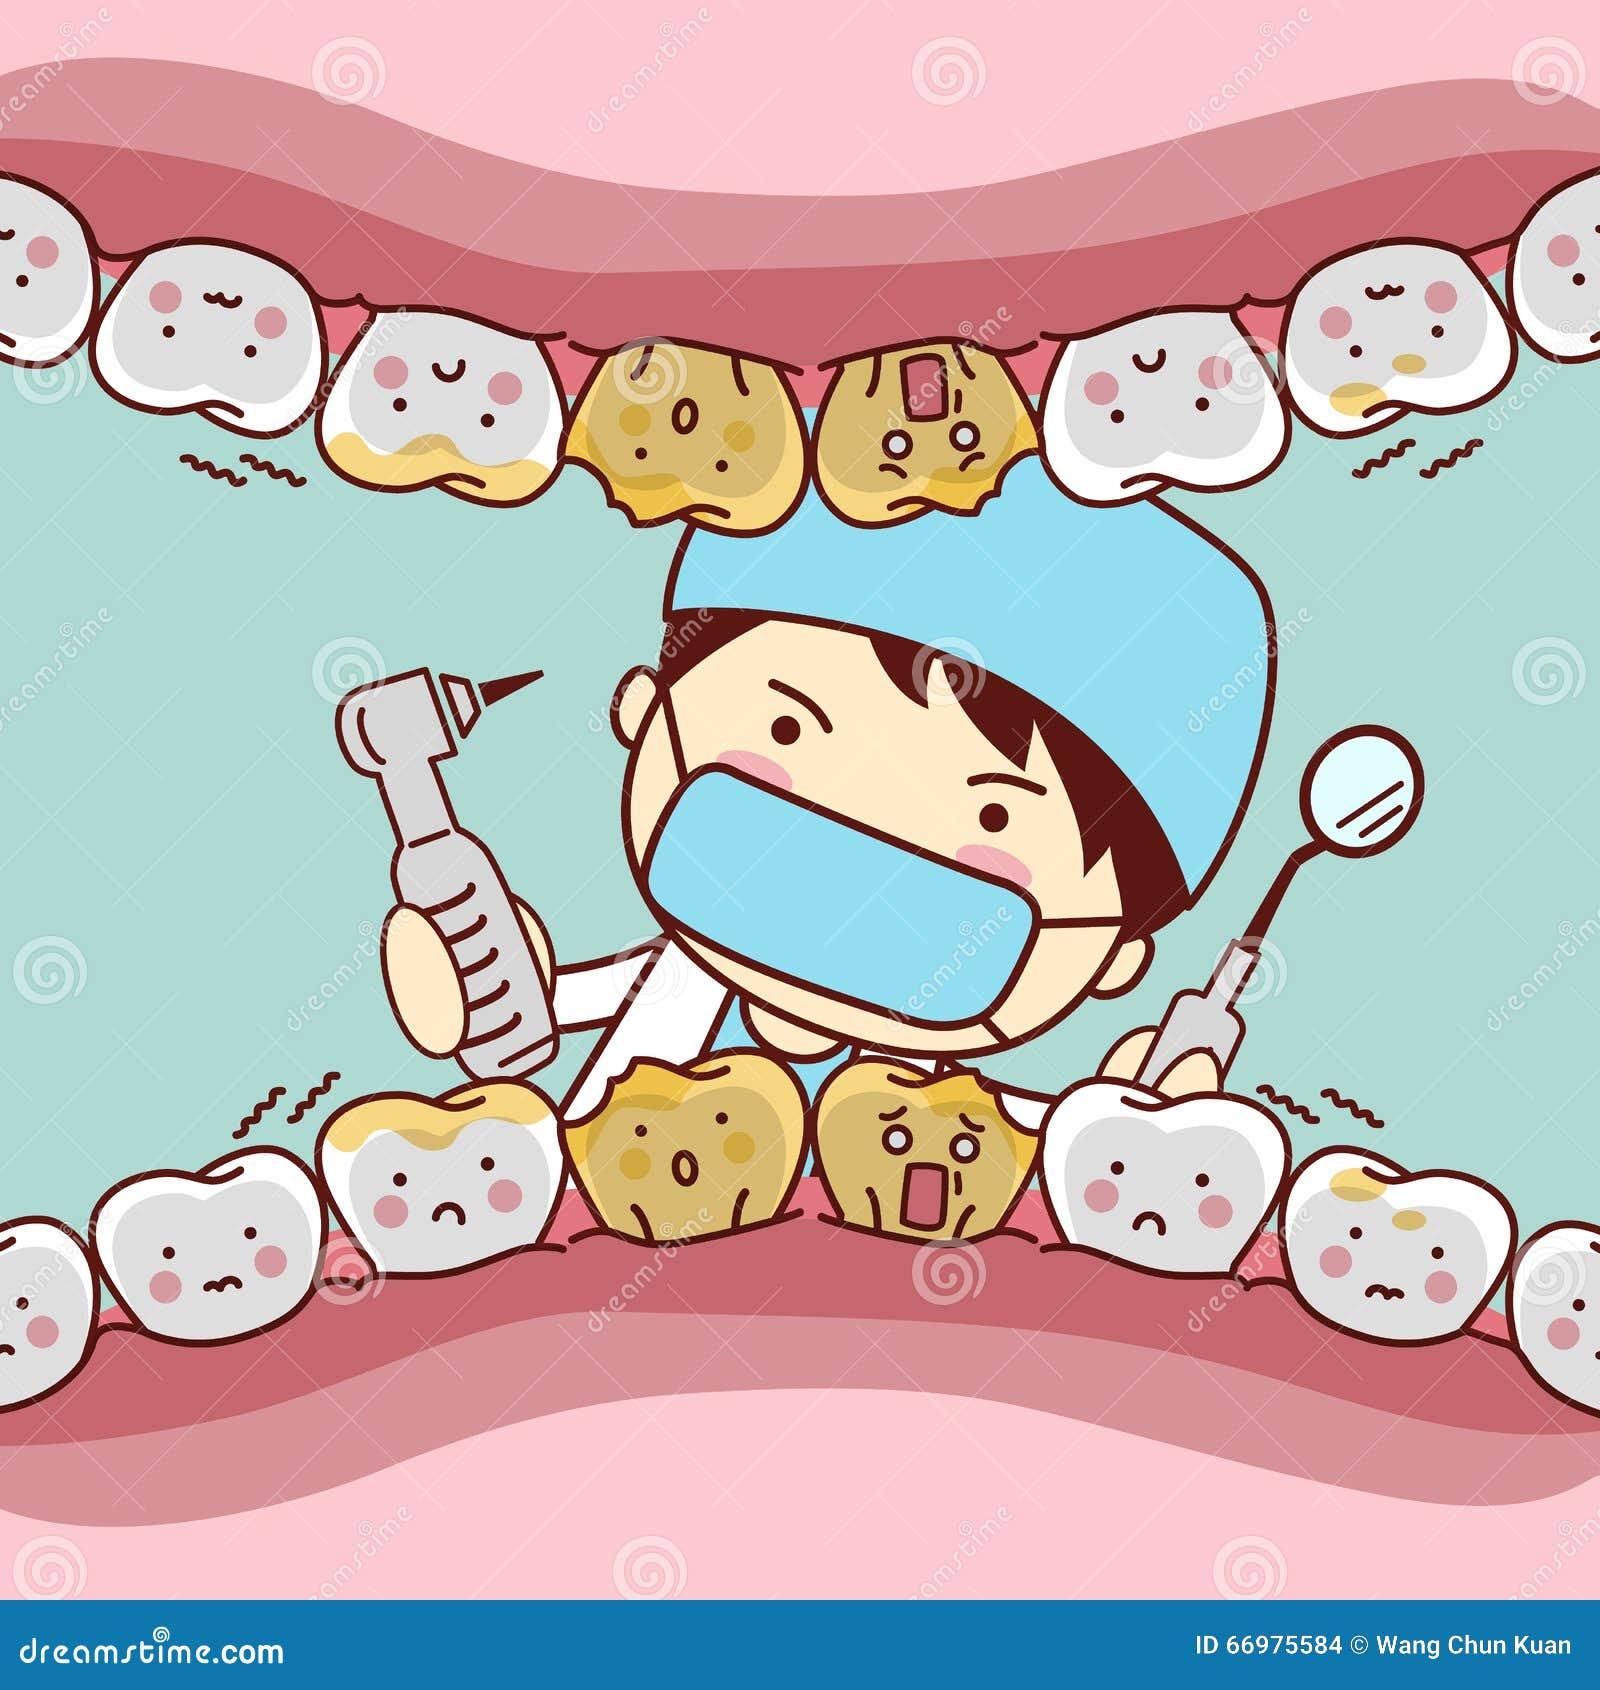 Cartoon fear tooth with dentist